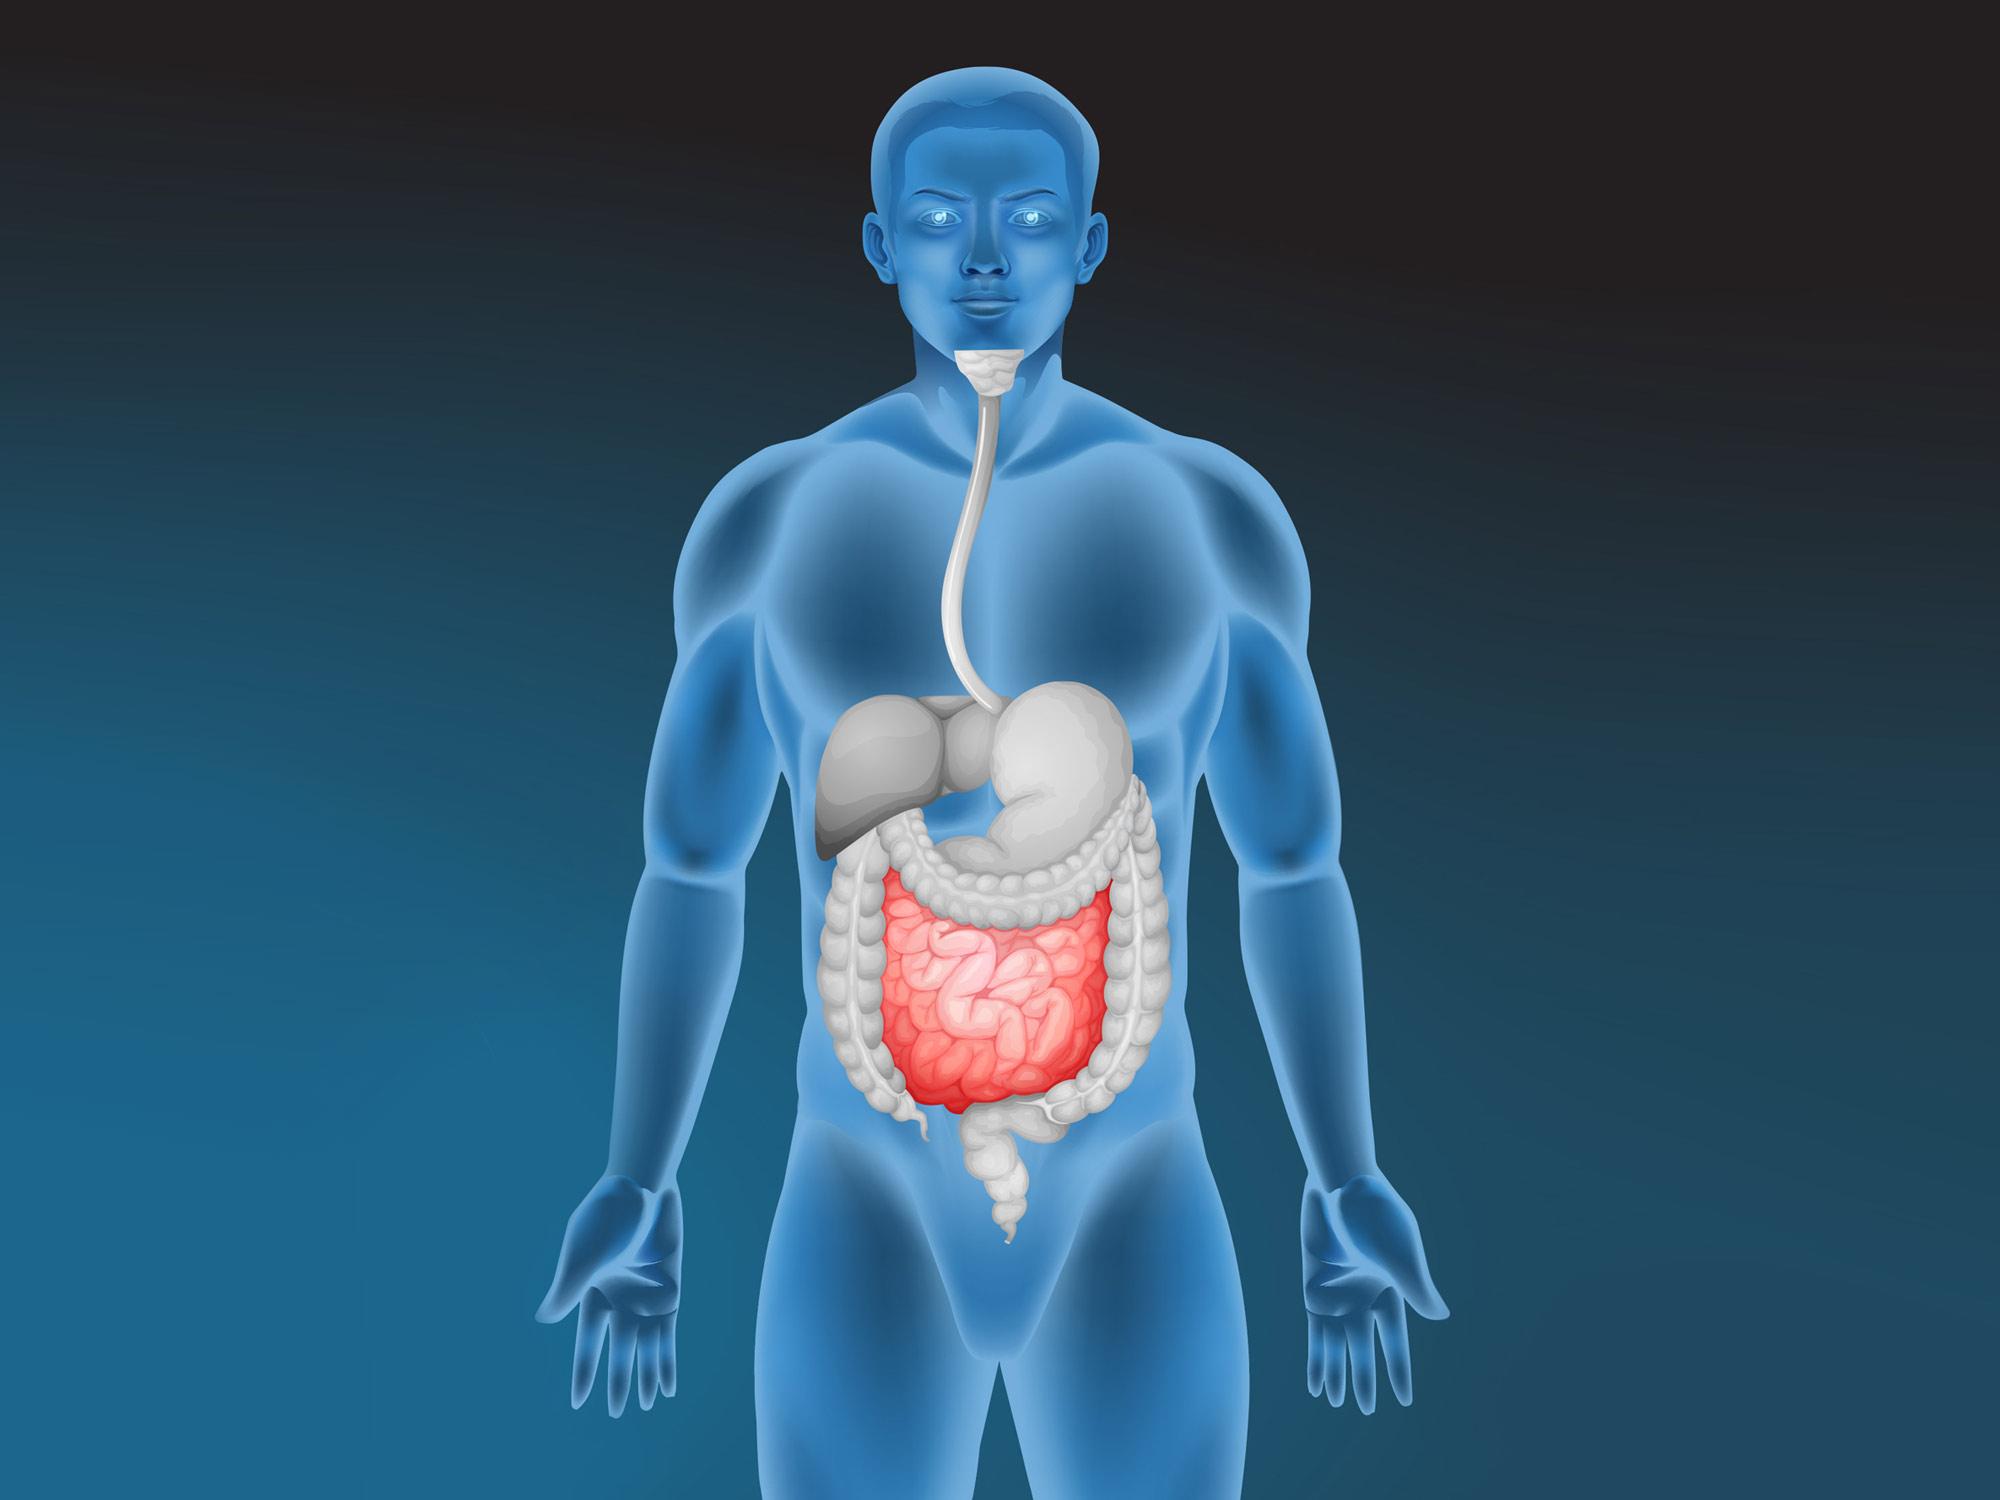 How do edibles affect you? - Sensi Seeds blog